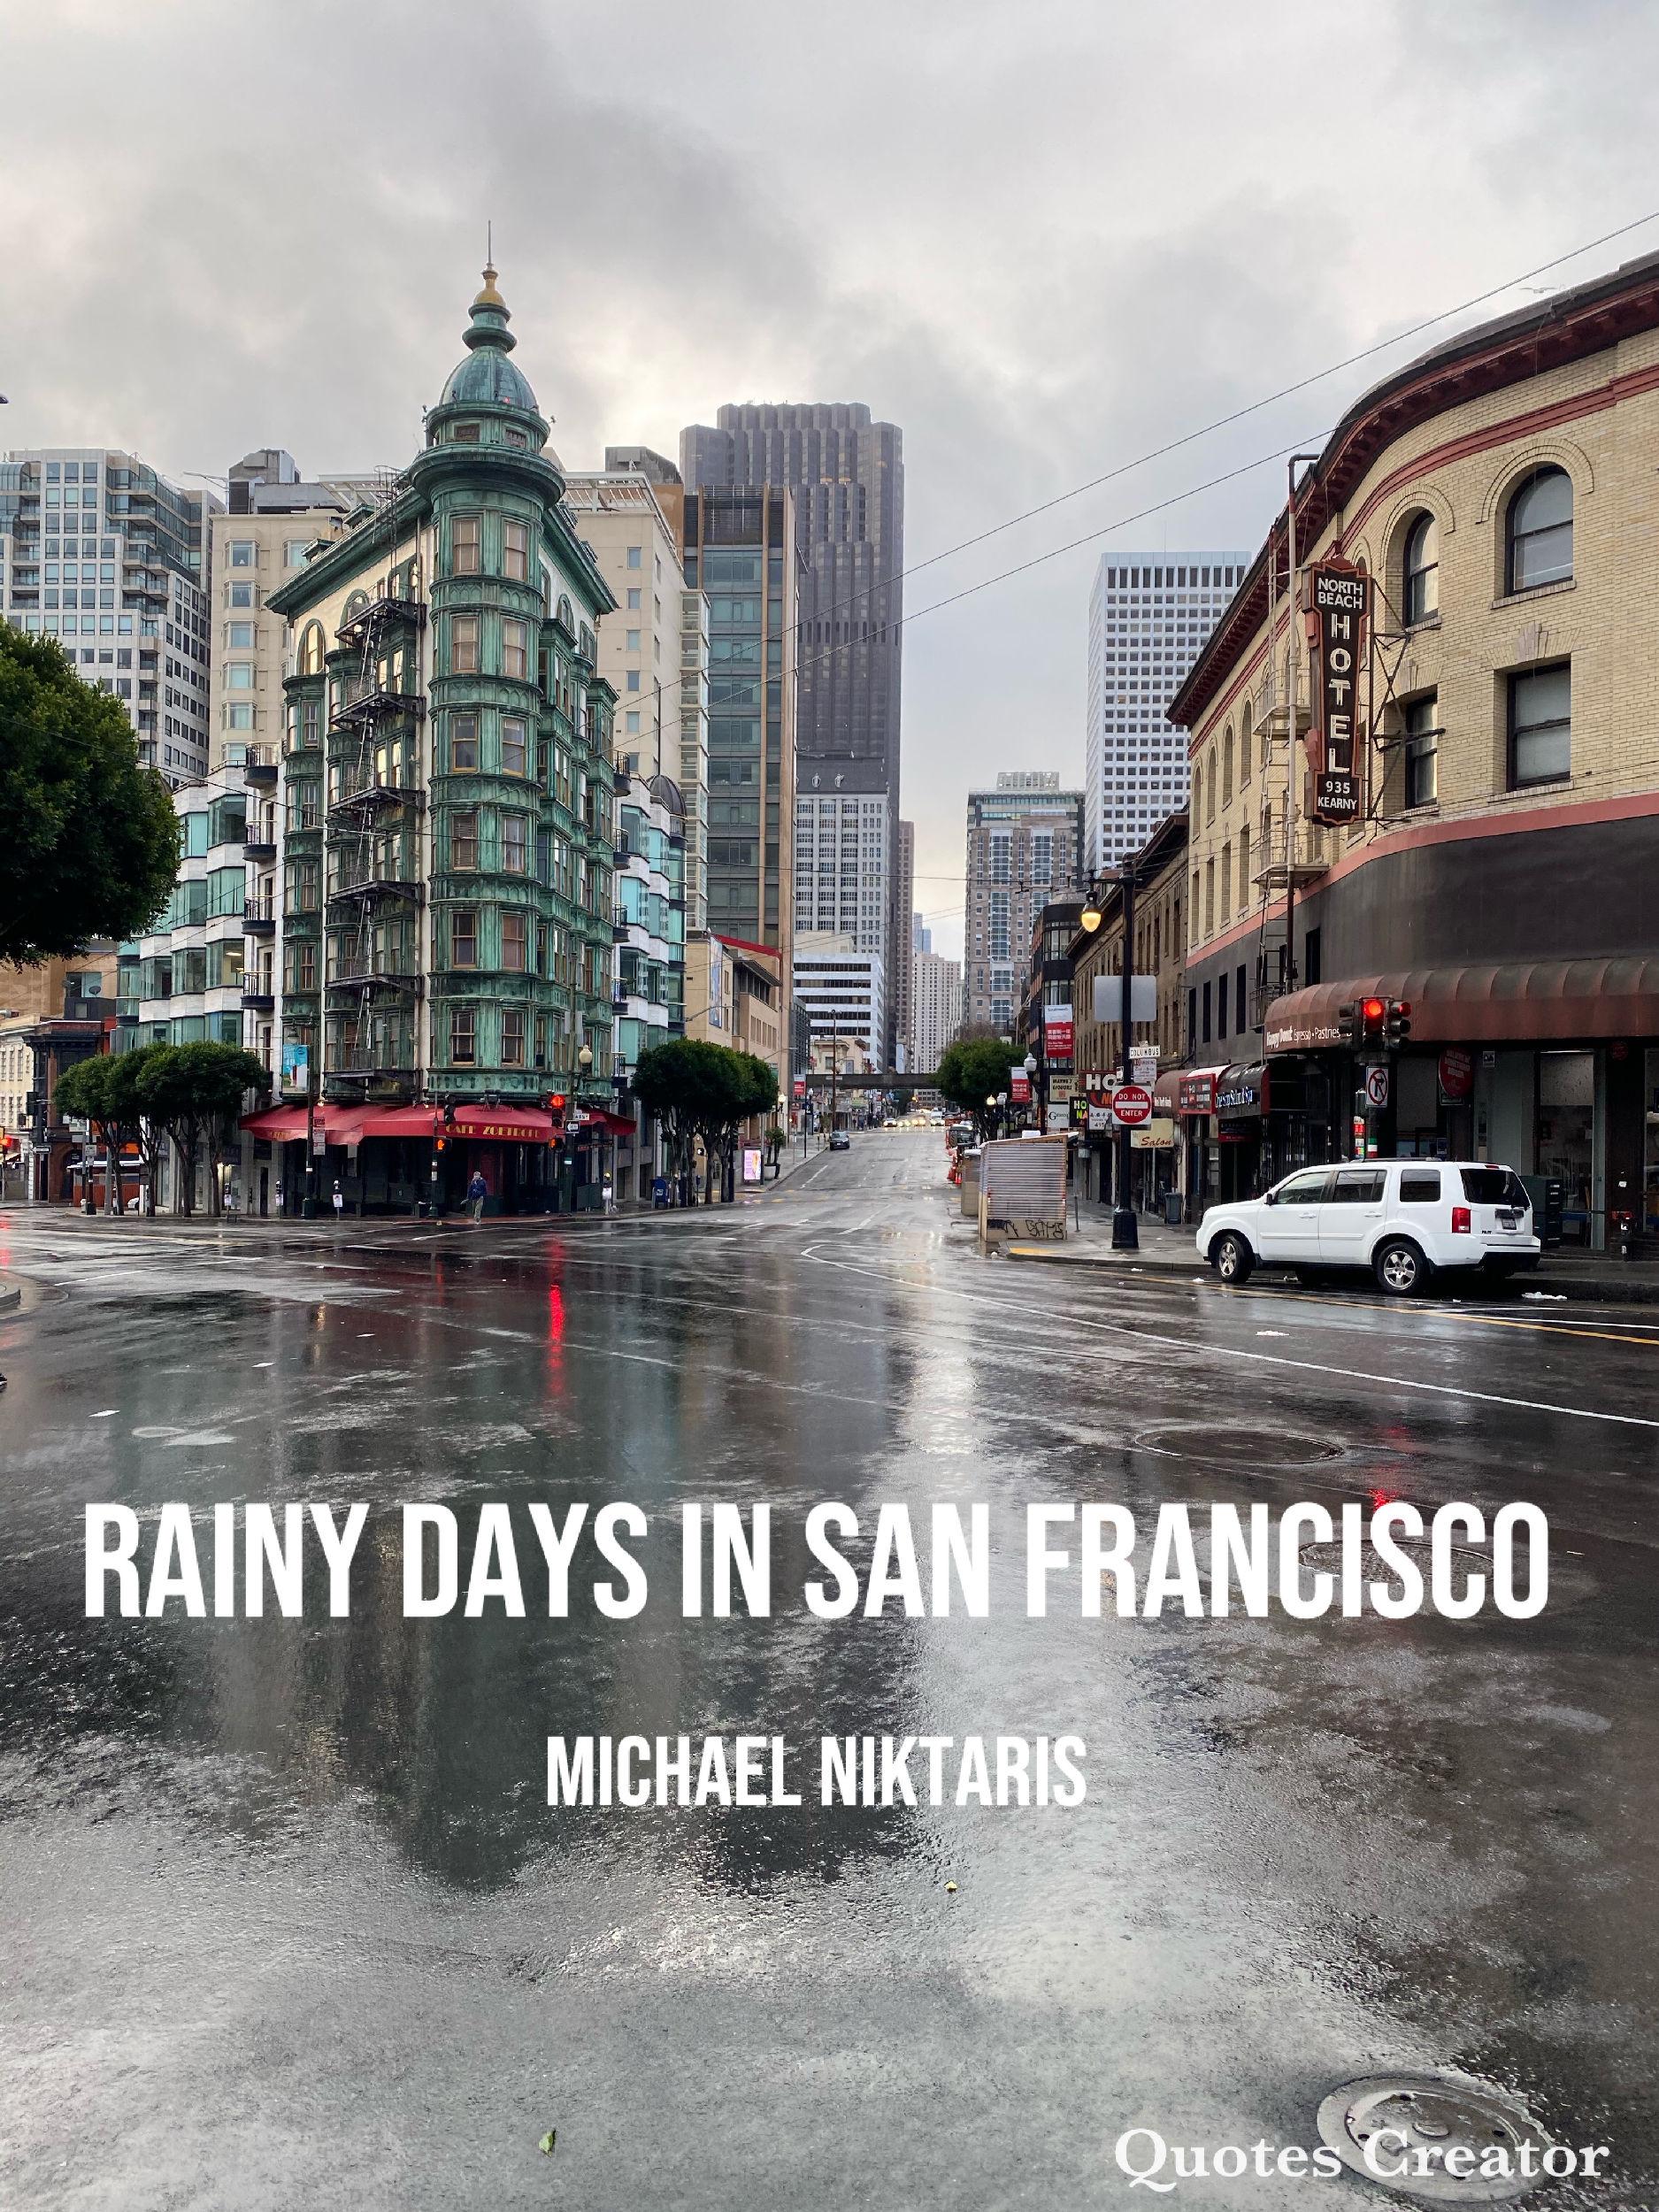 Columbus Ave. and Kearny in San Francisco